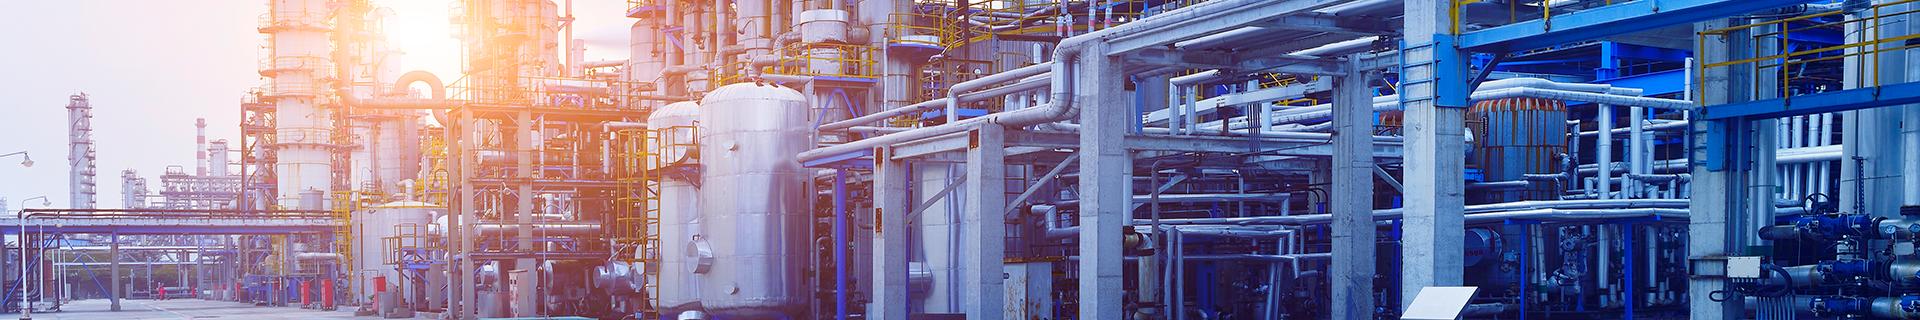 Precision Dosing in Industry